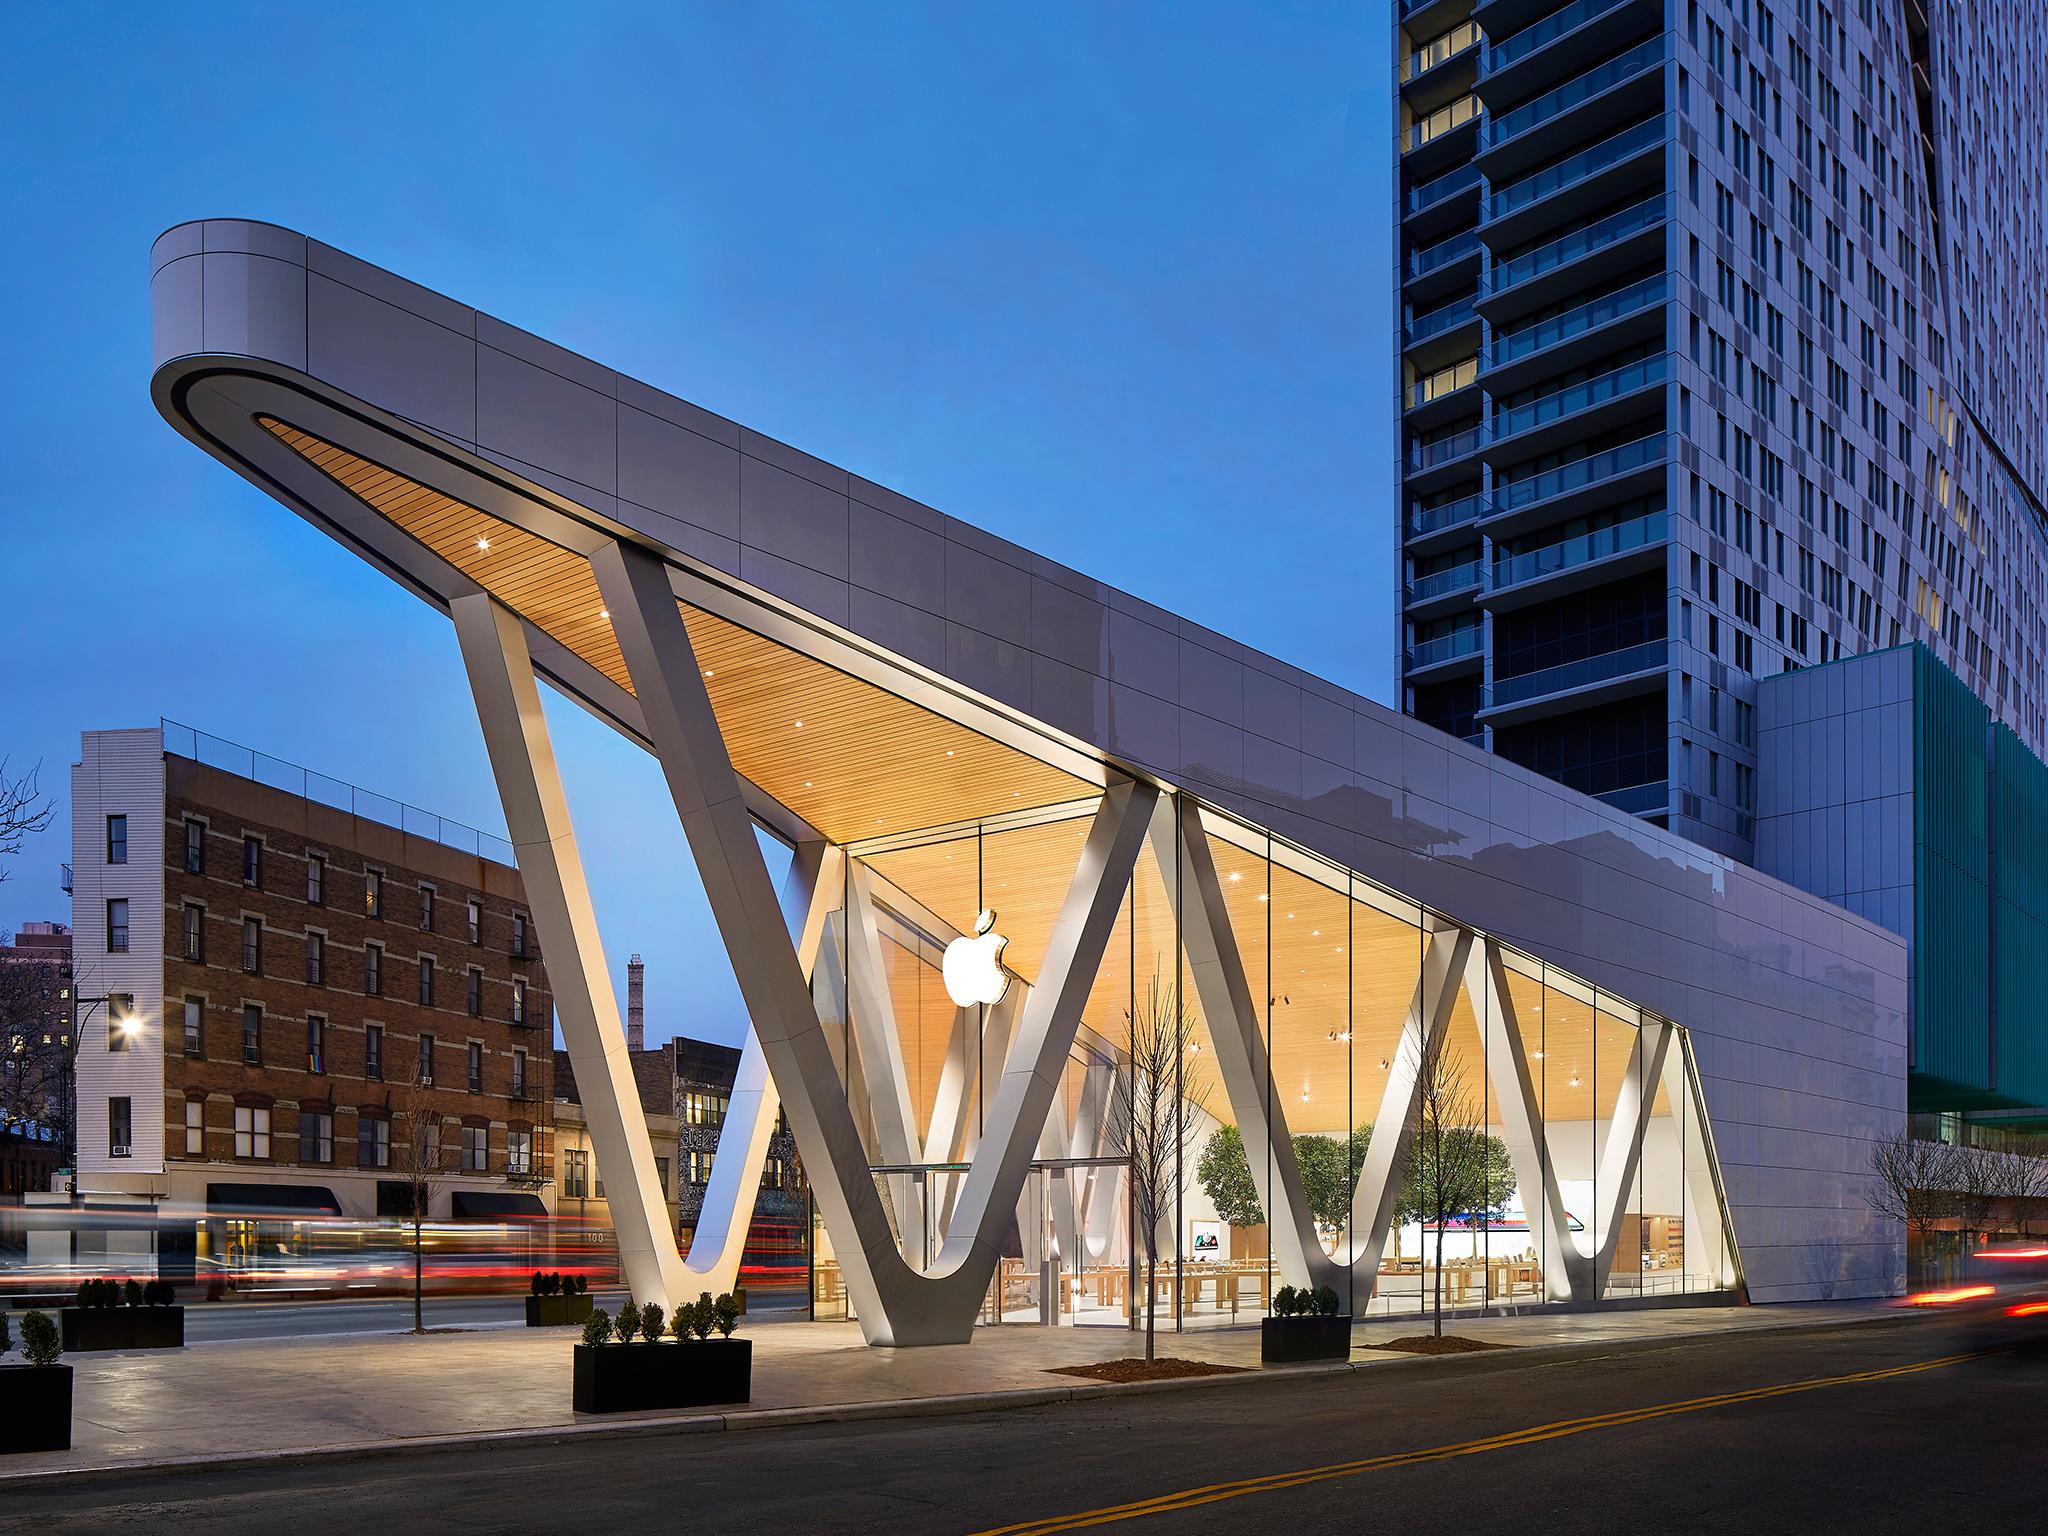 Apple Downtown Brooklyn - Brooklyn, NY 11217-1483 - (718)637-6200   ShowMeLocal.com